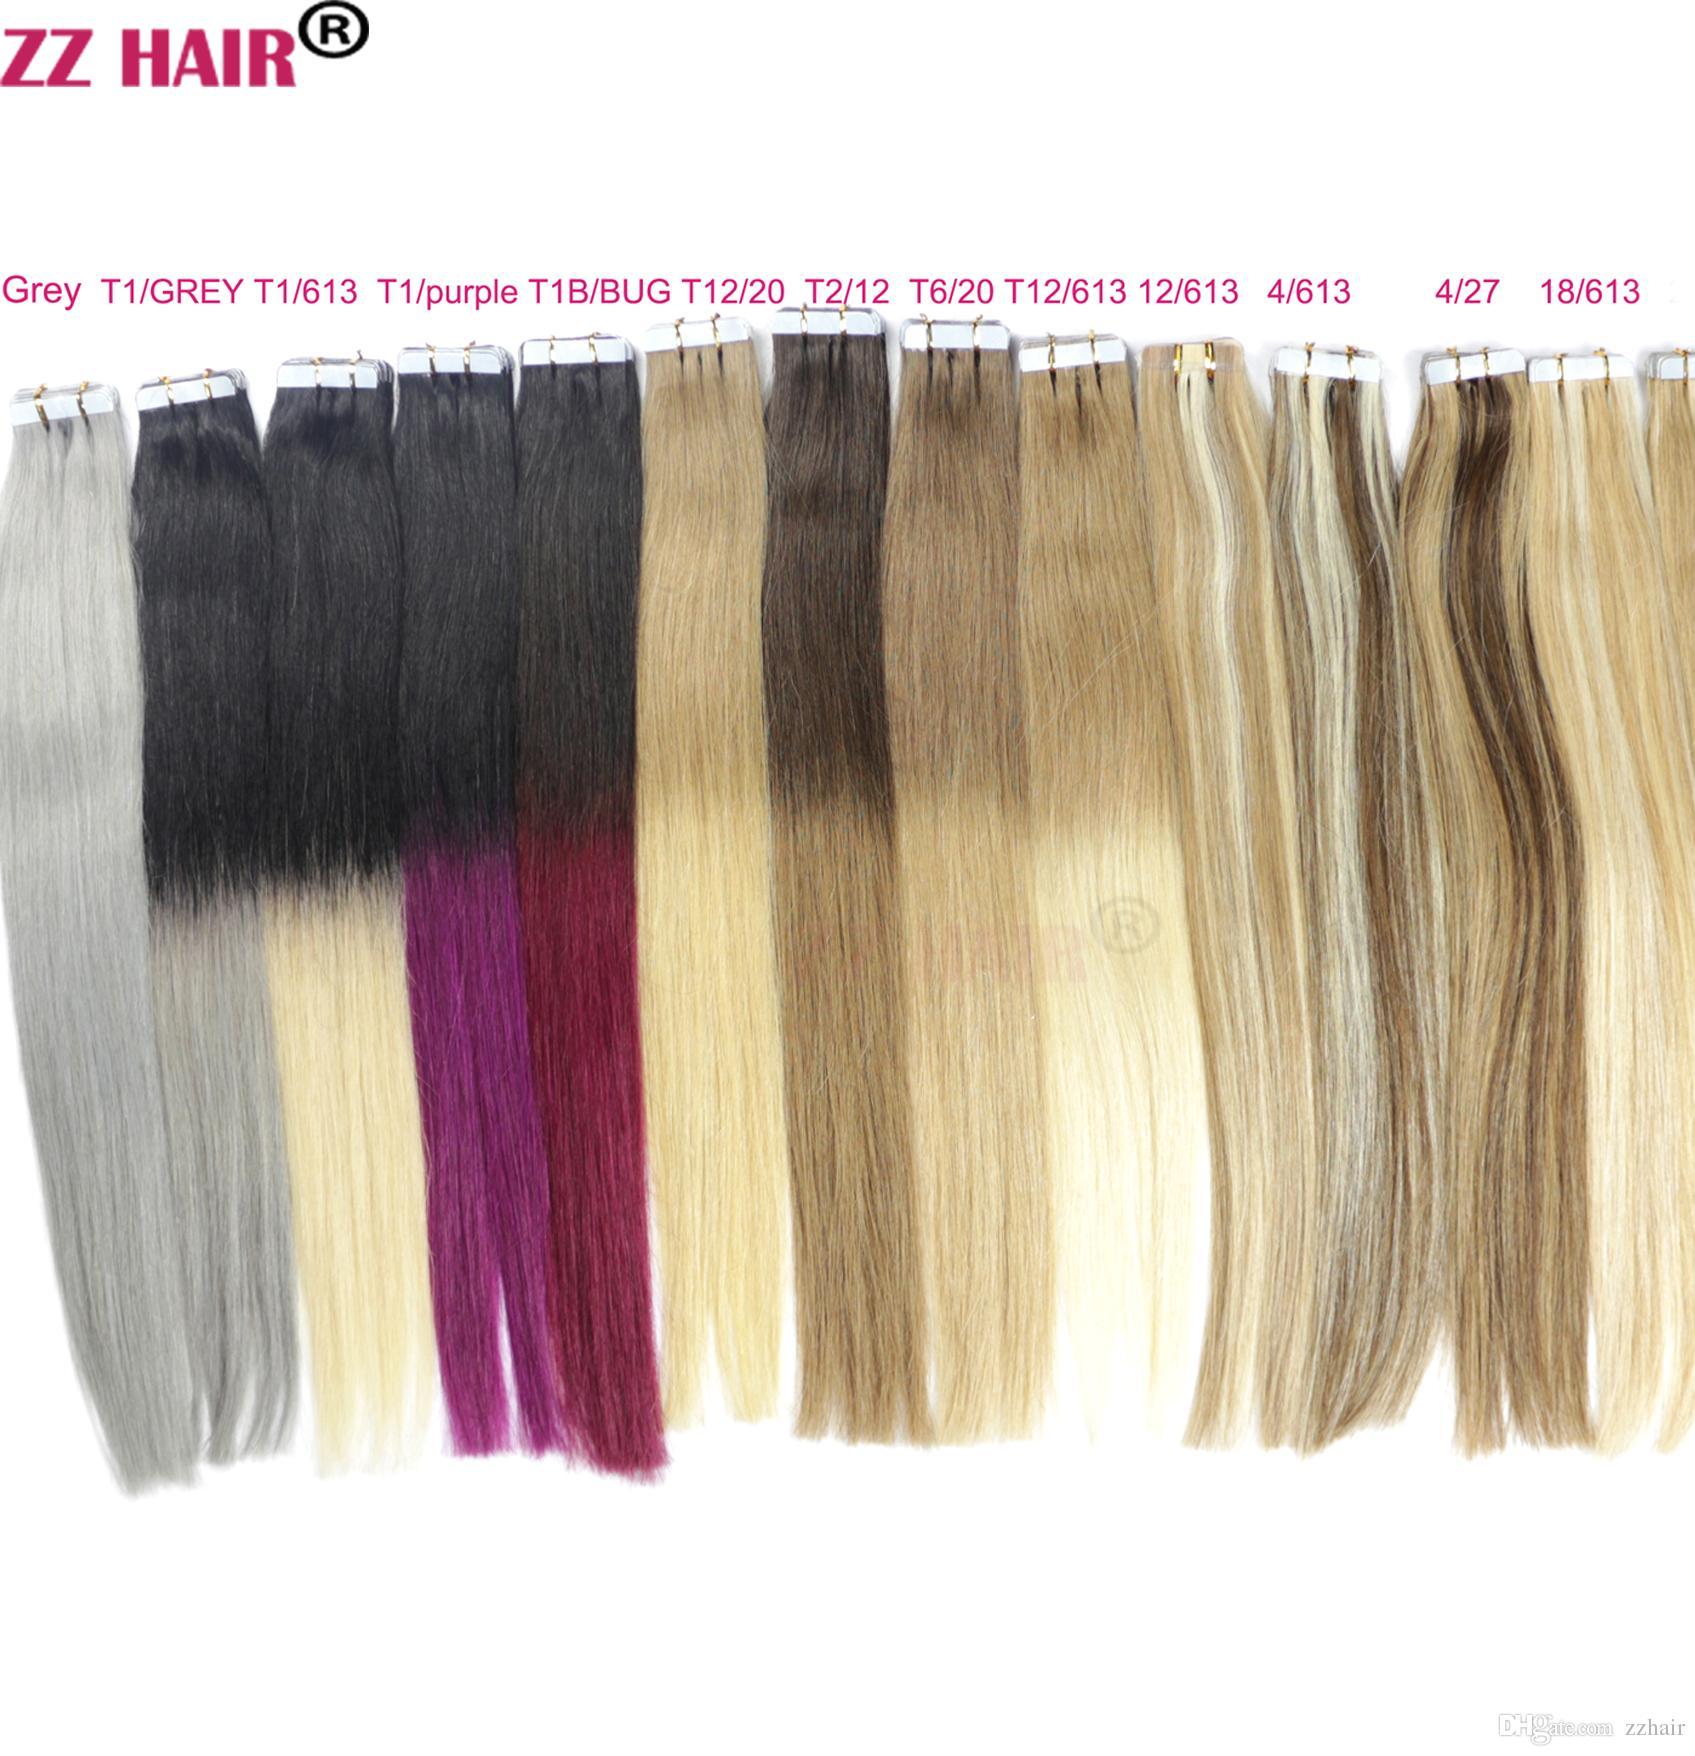 Zzhair 14-24 인치 100 % 브라질 테이프 레미 인간의 머리카락 확장 / 팩 접착제 헤어 스킨 웨스트 30G-70G